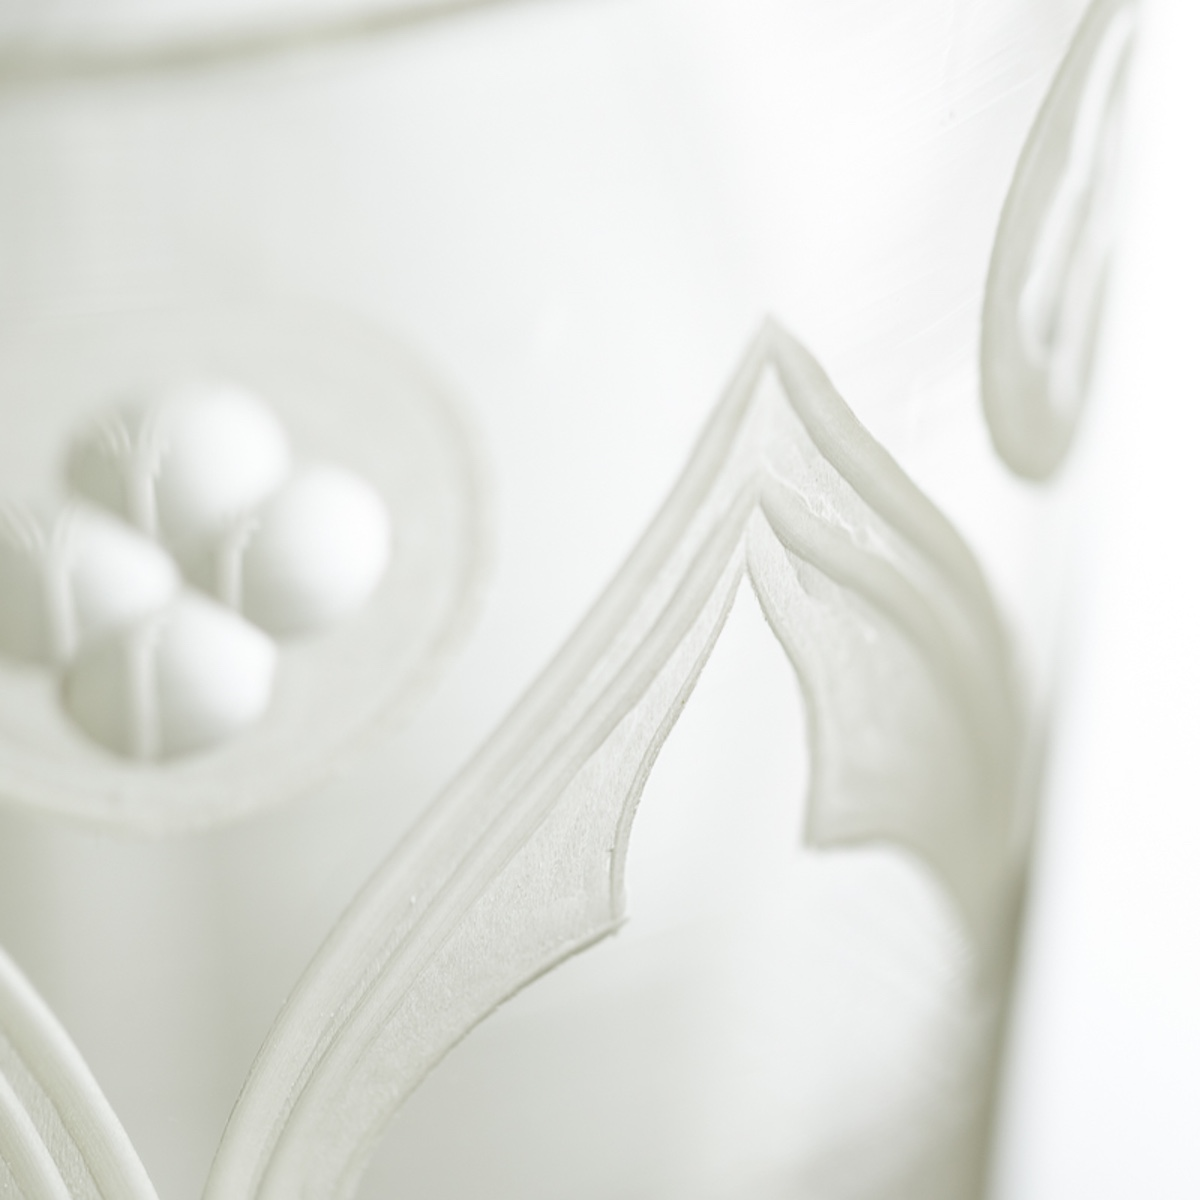 Palazzo-Ducaale-murano-glass-detail